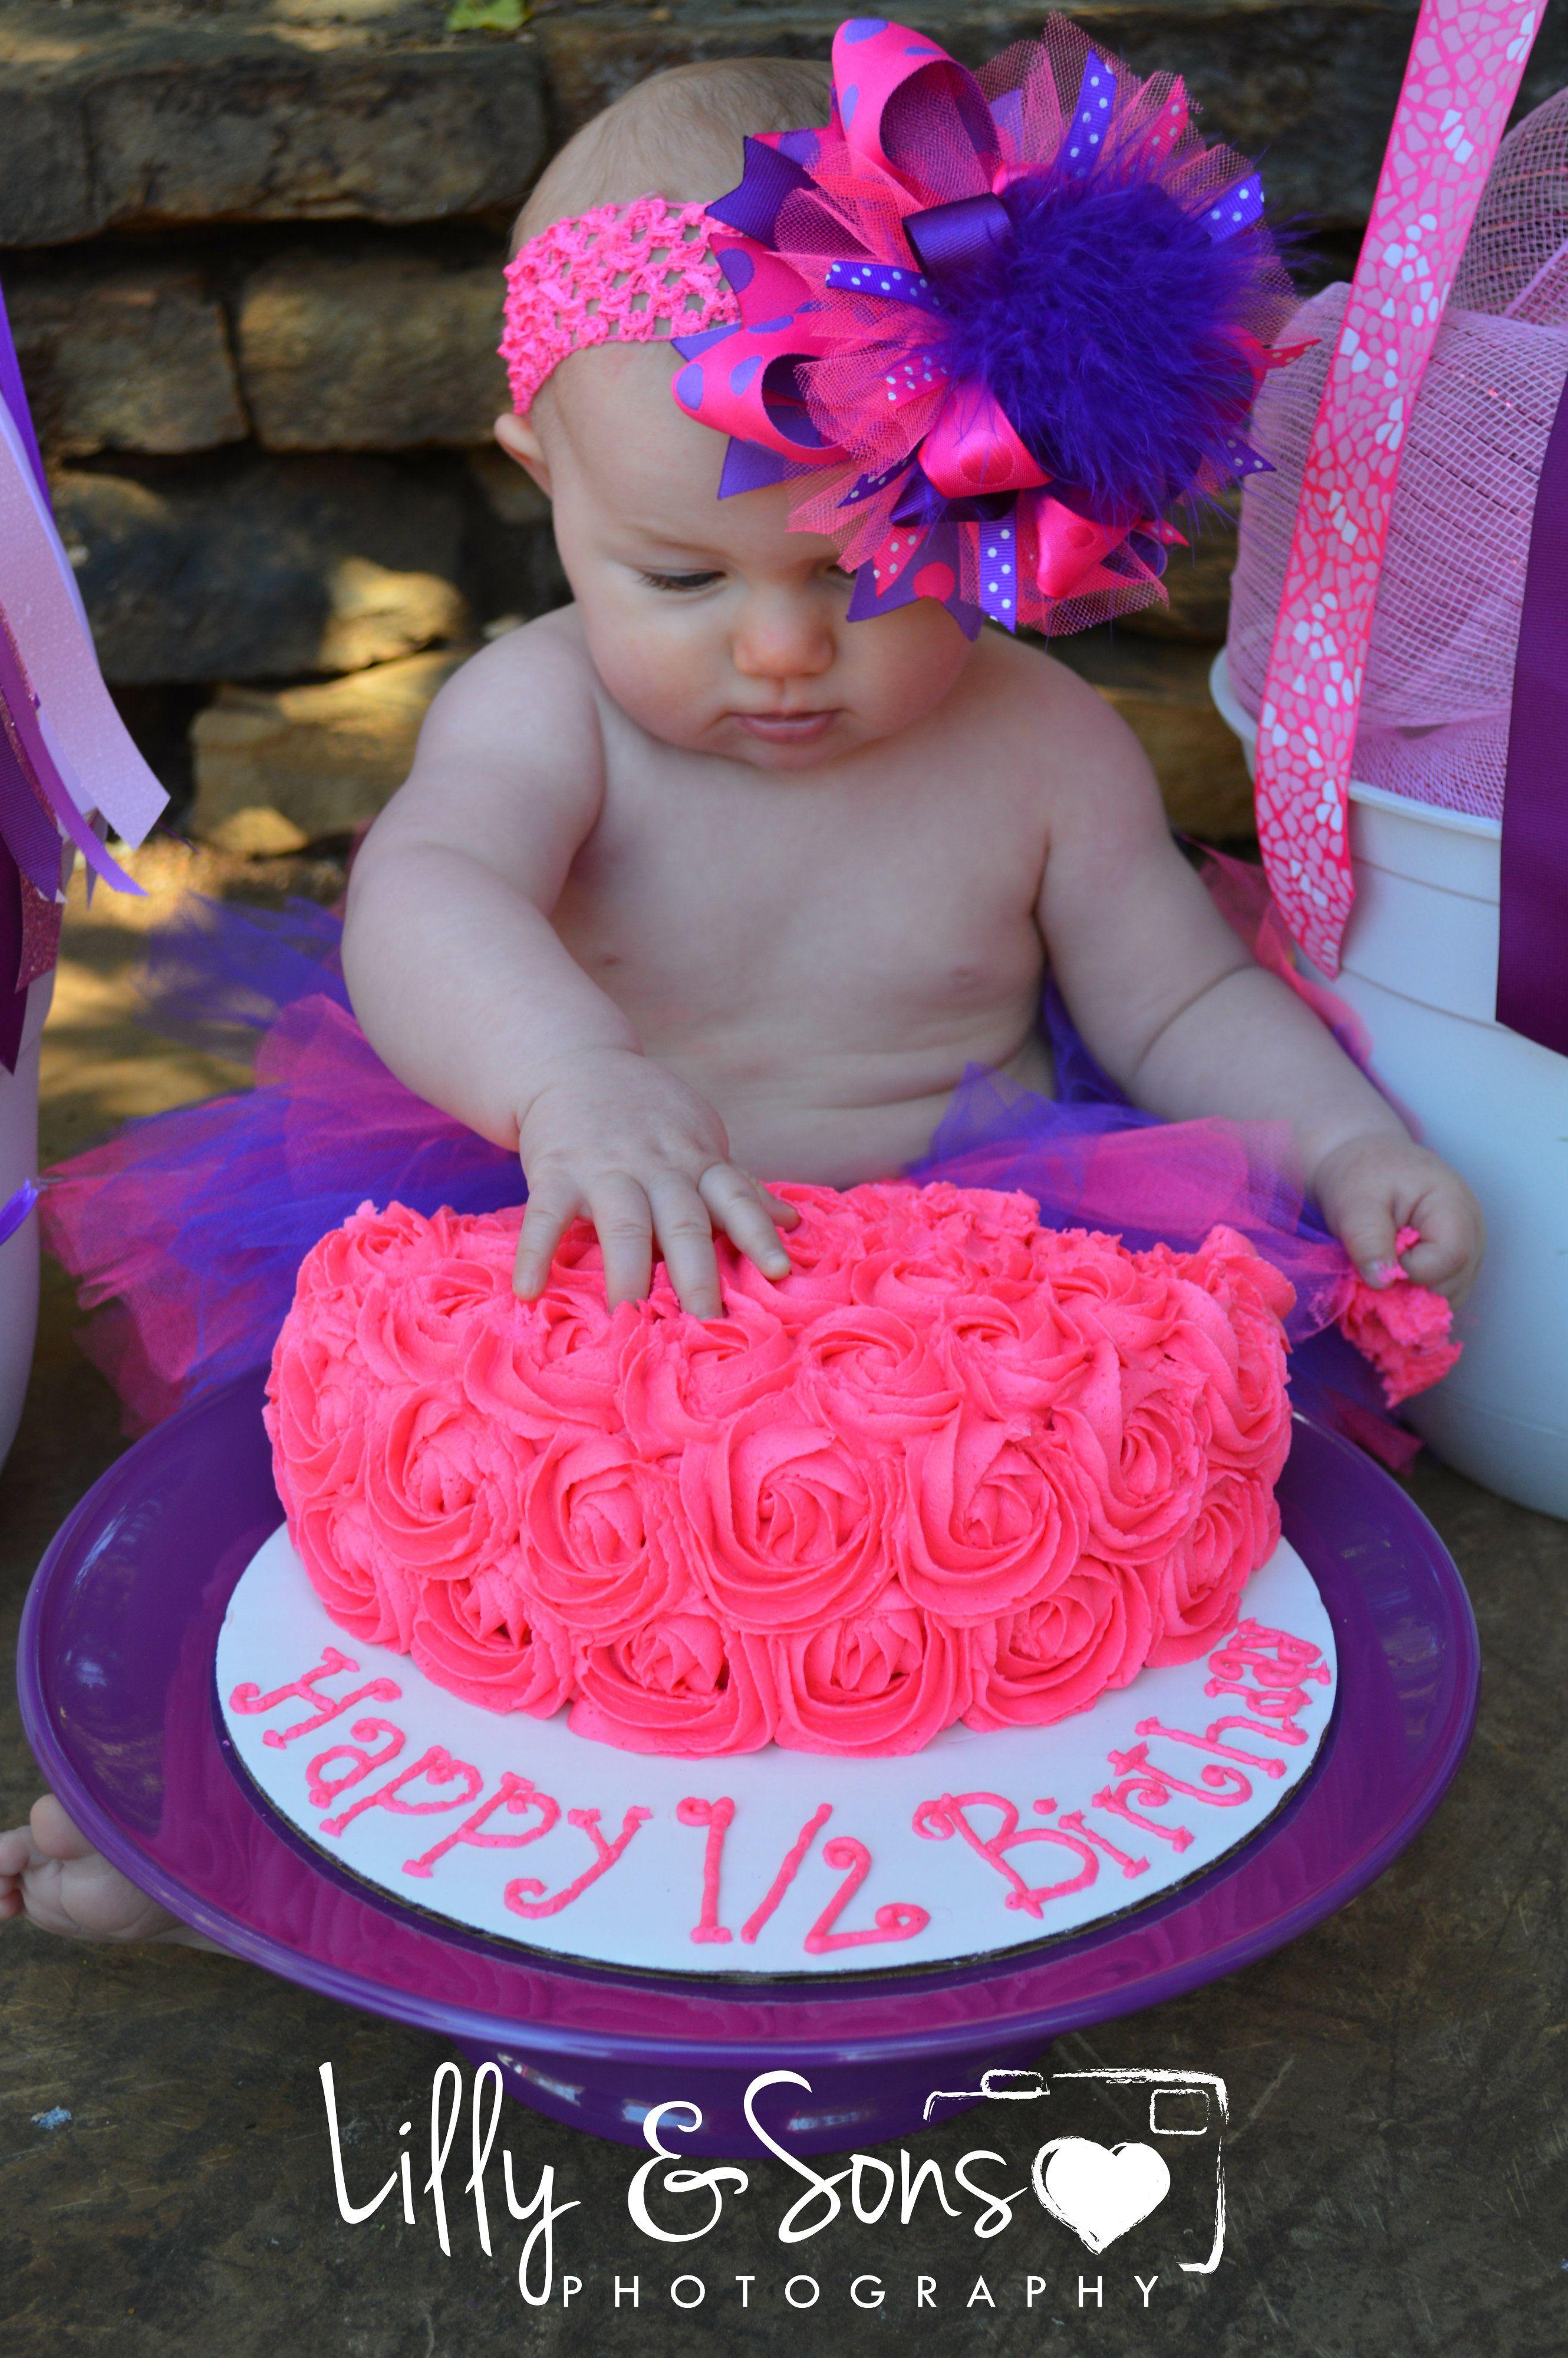 Baby Brylee 1 2 Birthday 6 Months Cake Smash